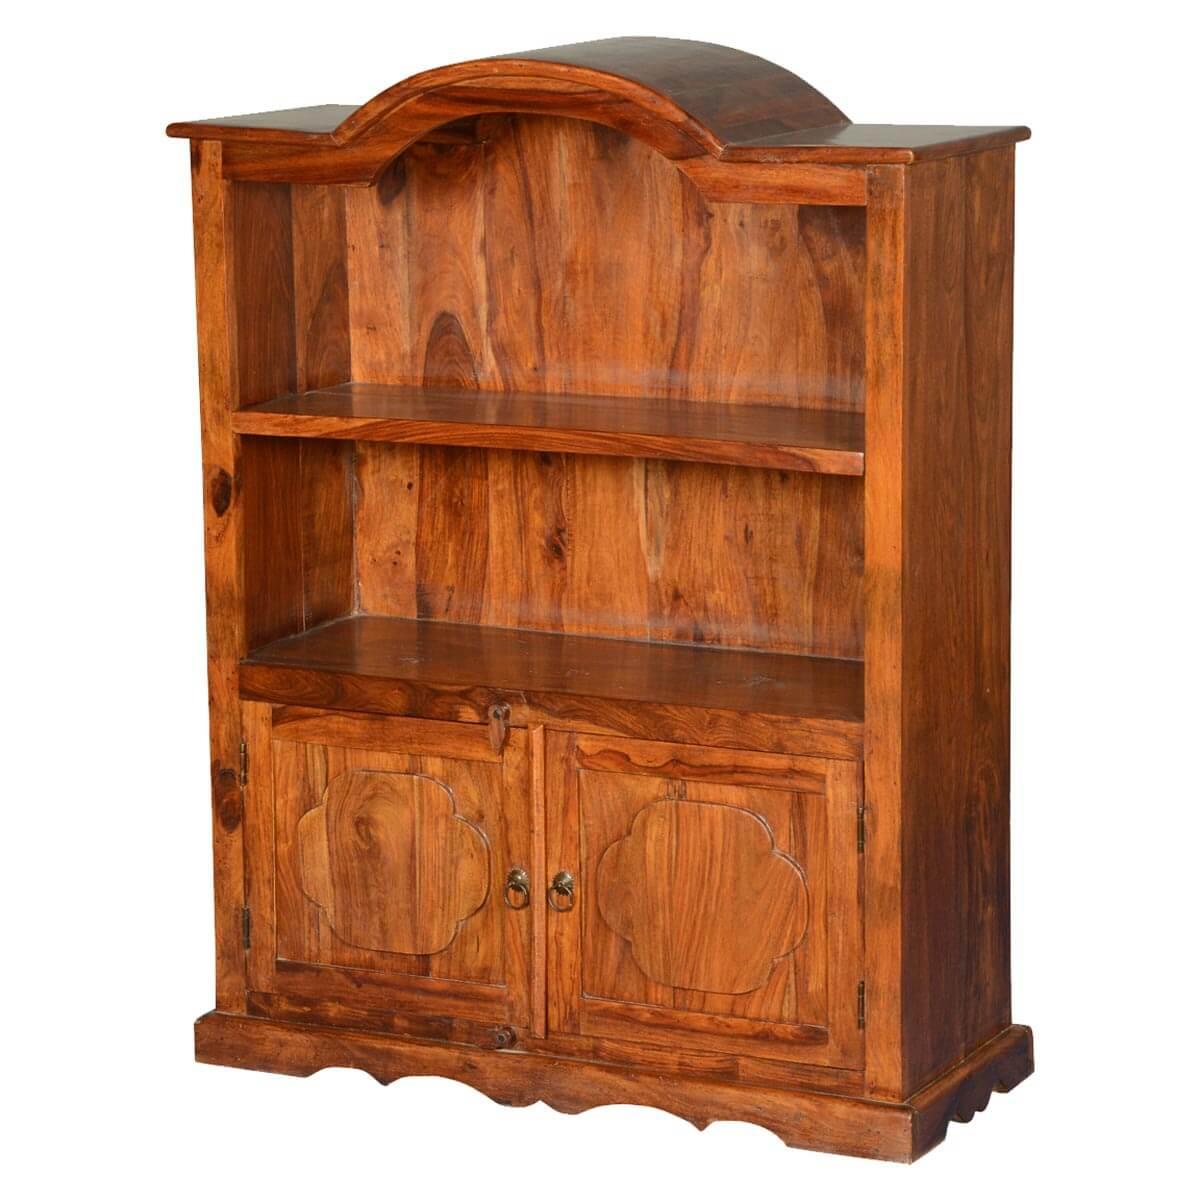 Pennsylvania Dutch 2 Open Shelf Rustic Solid Wood Bookcase Hutch